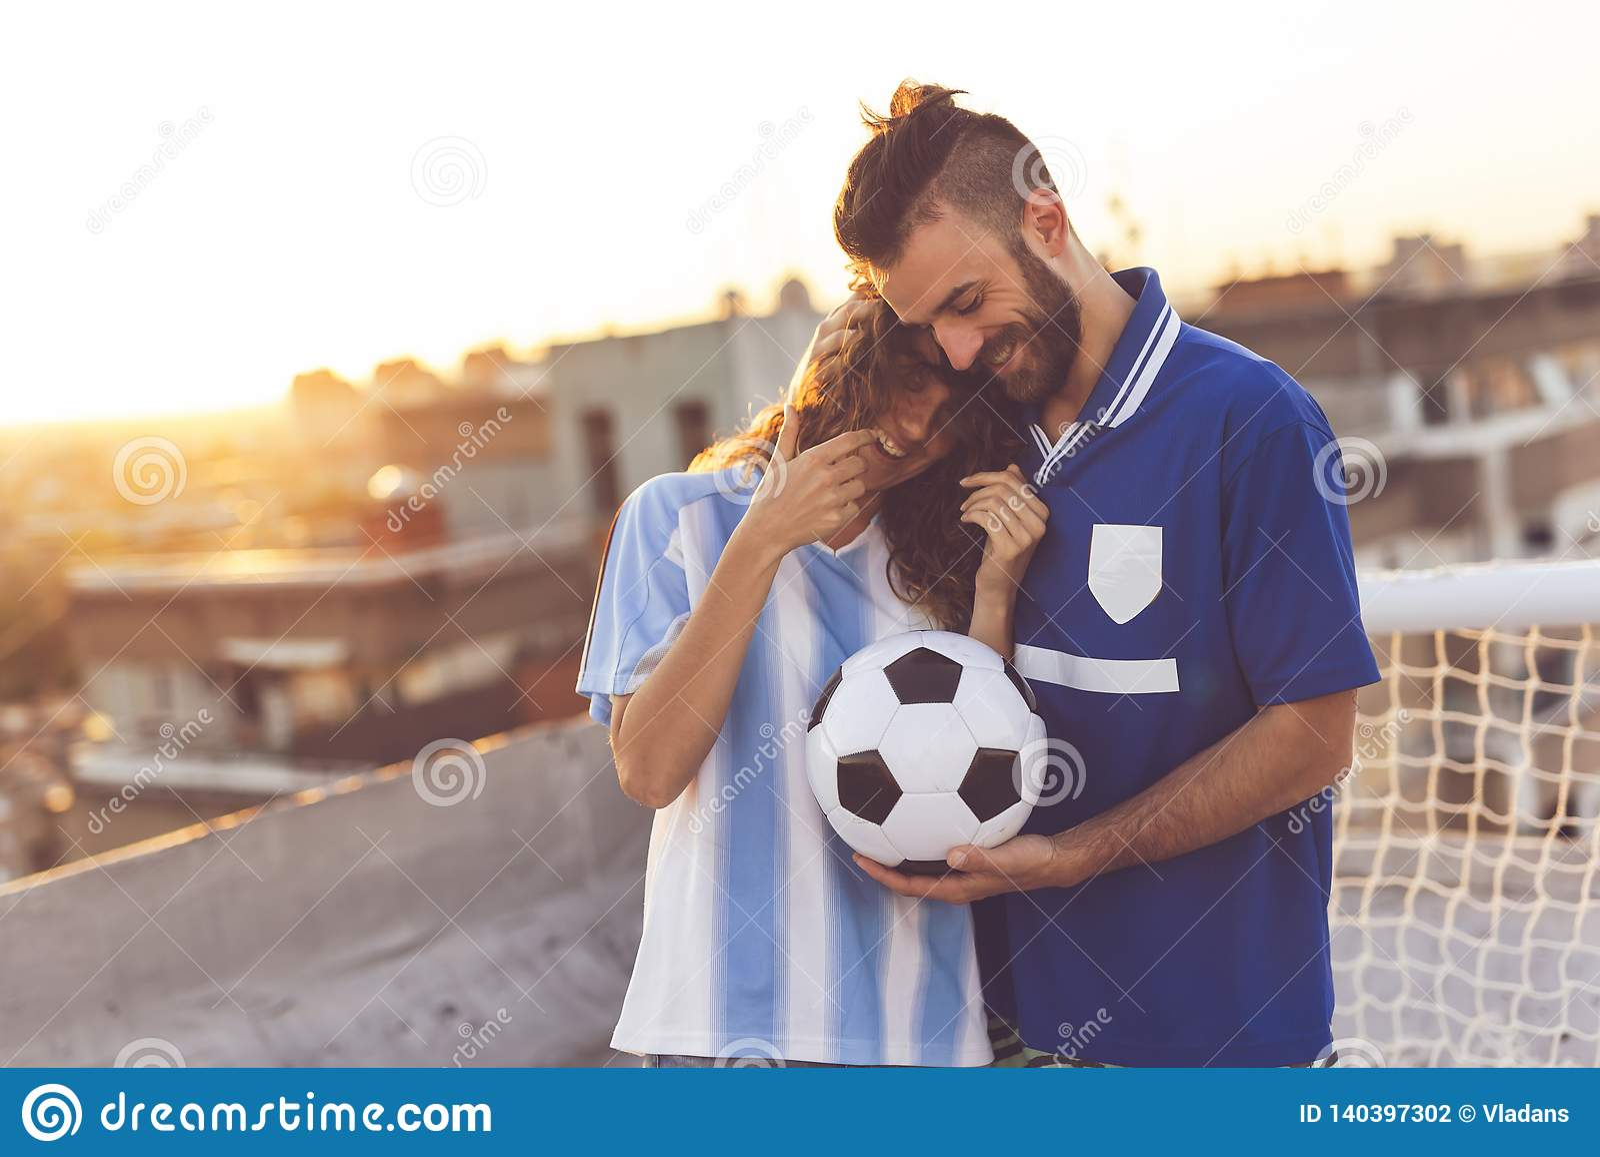 Football fans couple